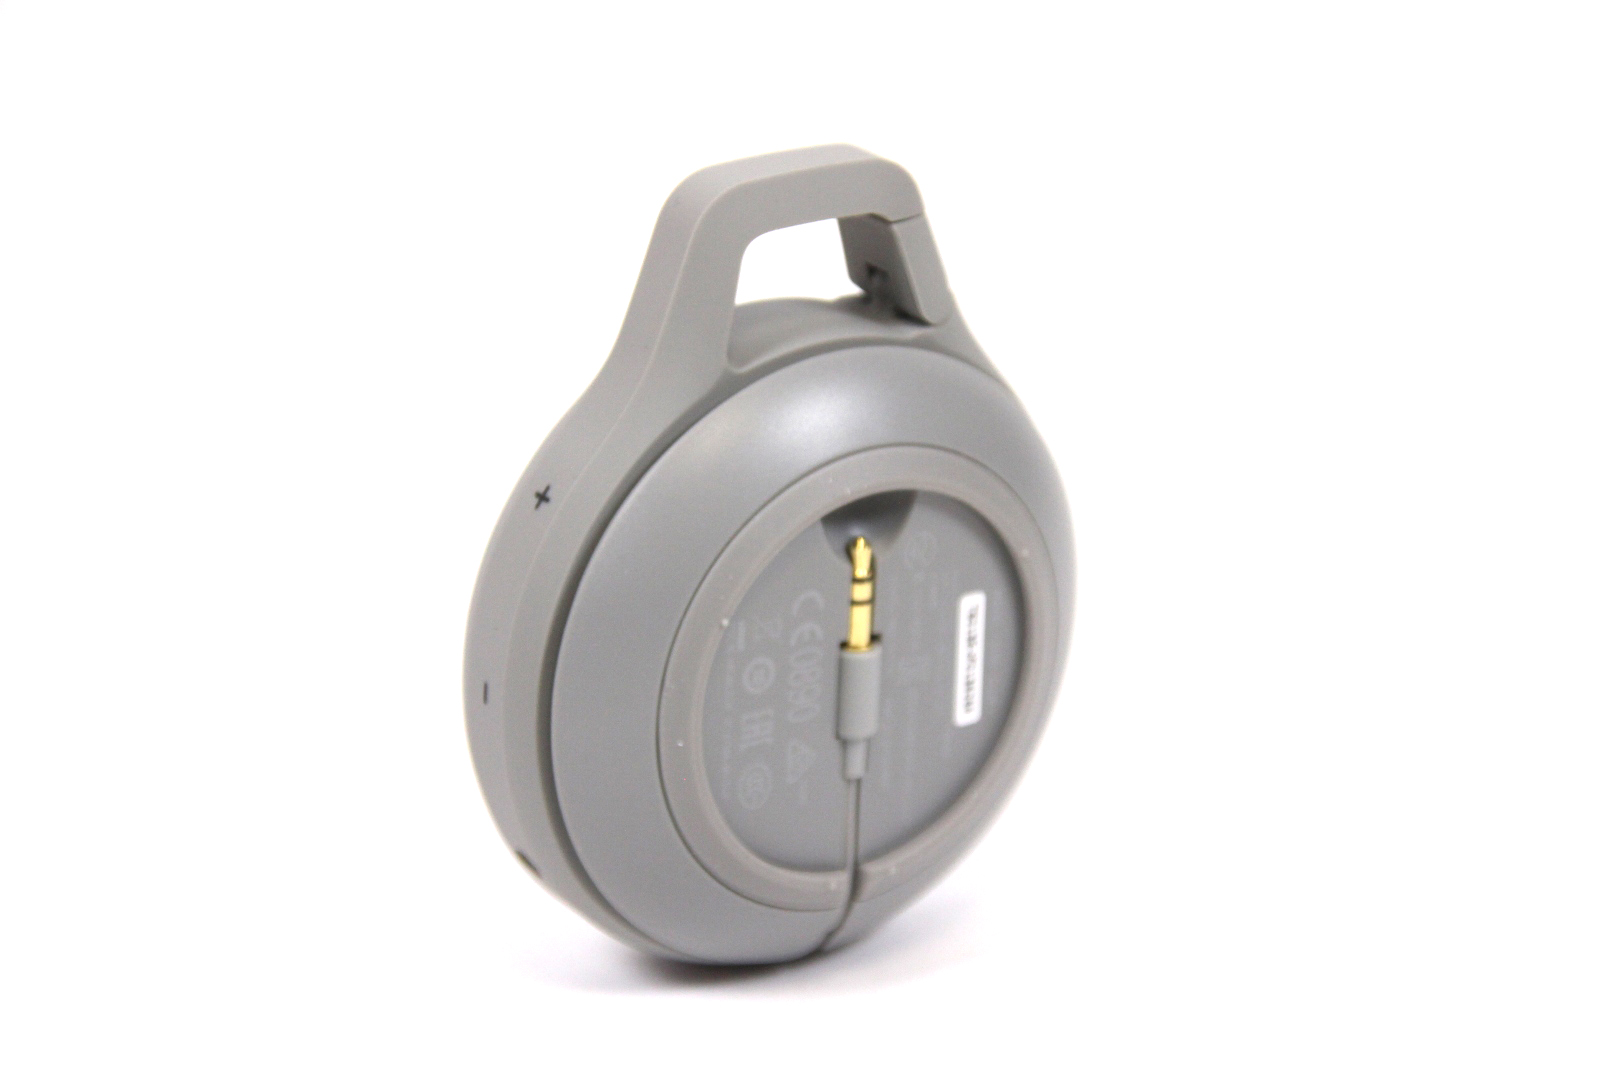 jbl clip kabelloser bluetooth lautsprecher grau portable box speaker karabiner ebay. Black Bedroom Furniture Sets. Home Design Ideas